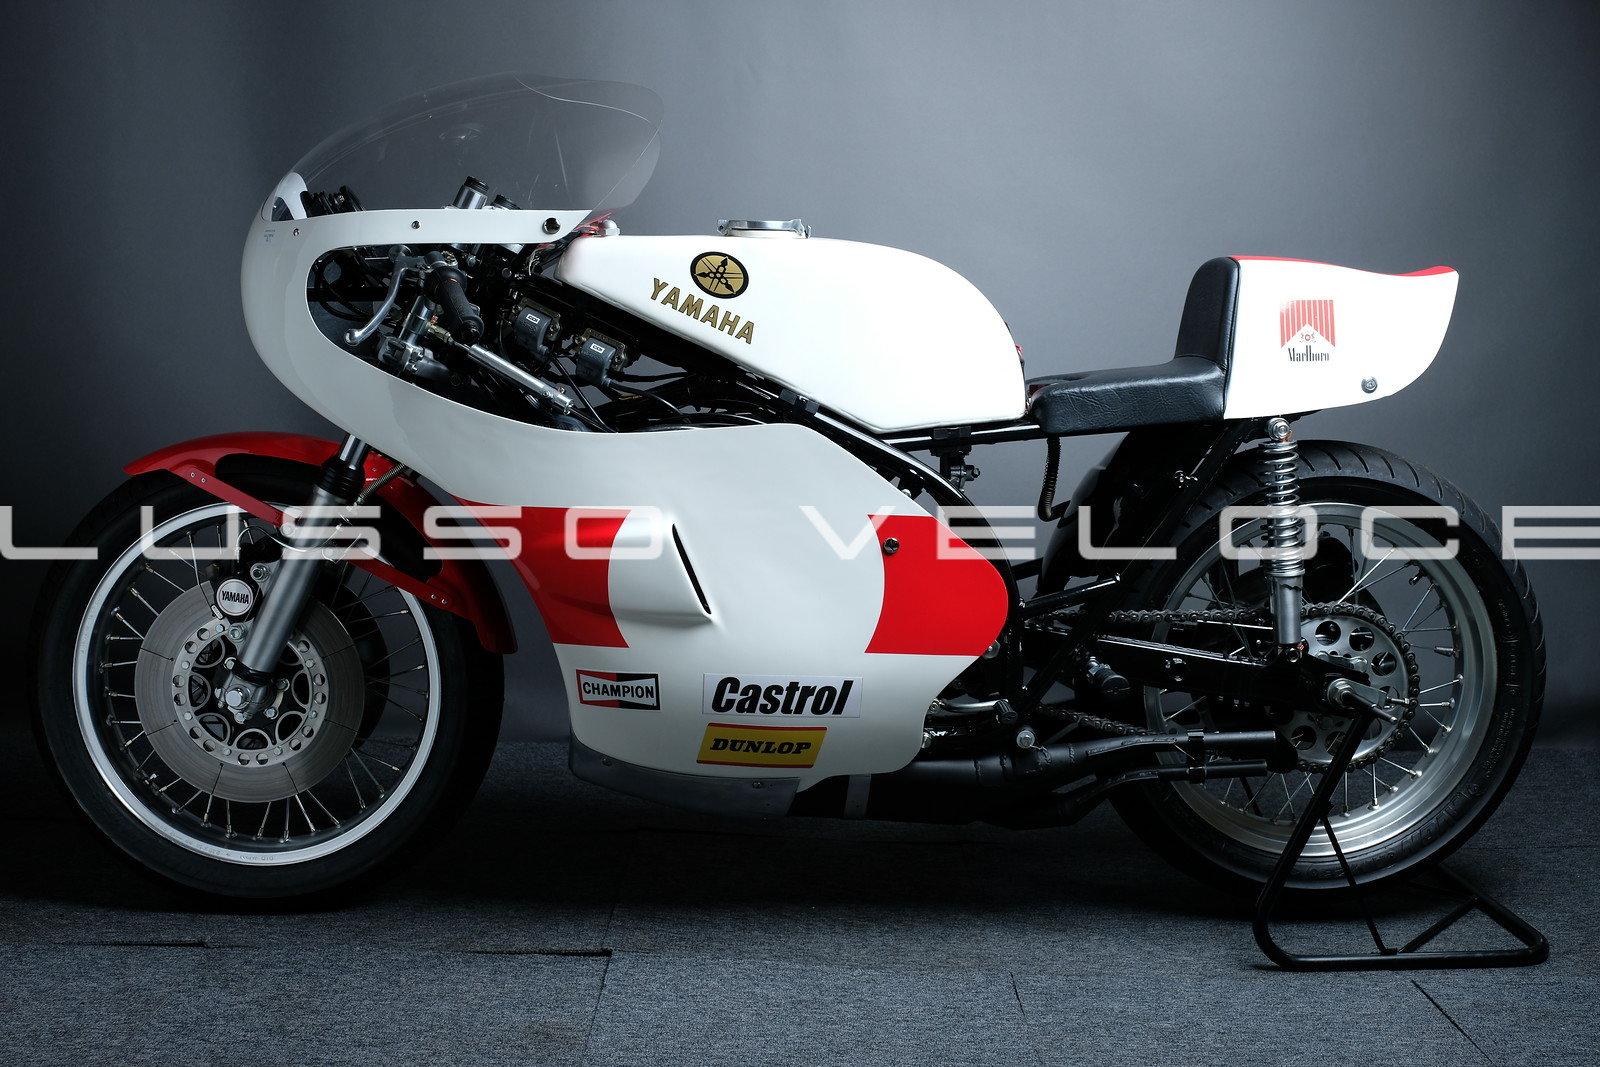 1975 Yamaha TZ 750 C GP Race bike For Sale (picture 2 of 6)